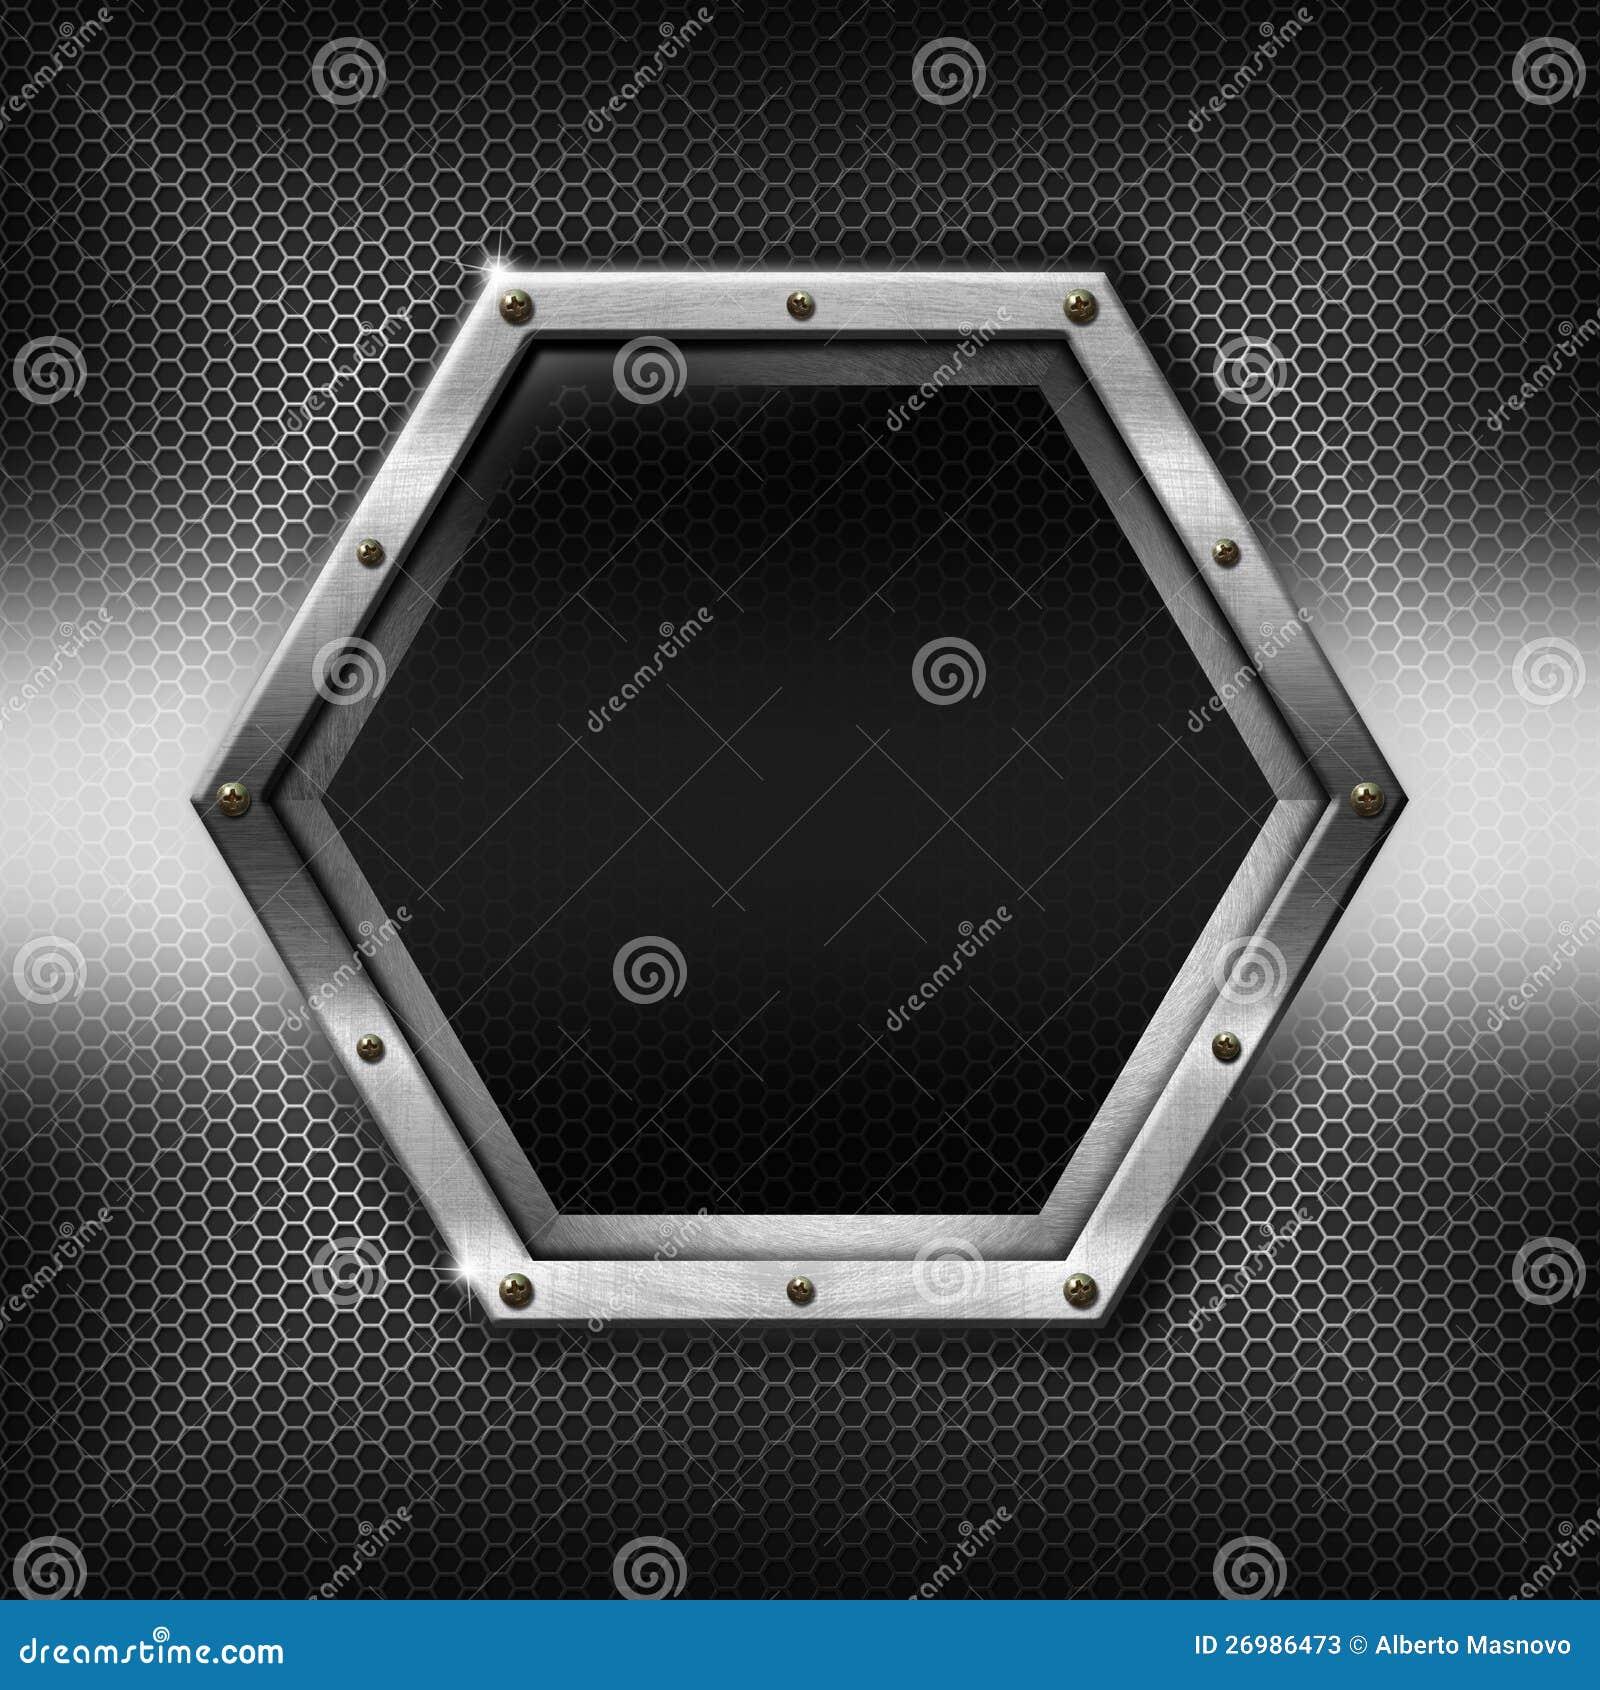 Hexagons Metal Template With Hexagonal Metal Frame Stock ...